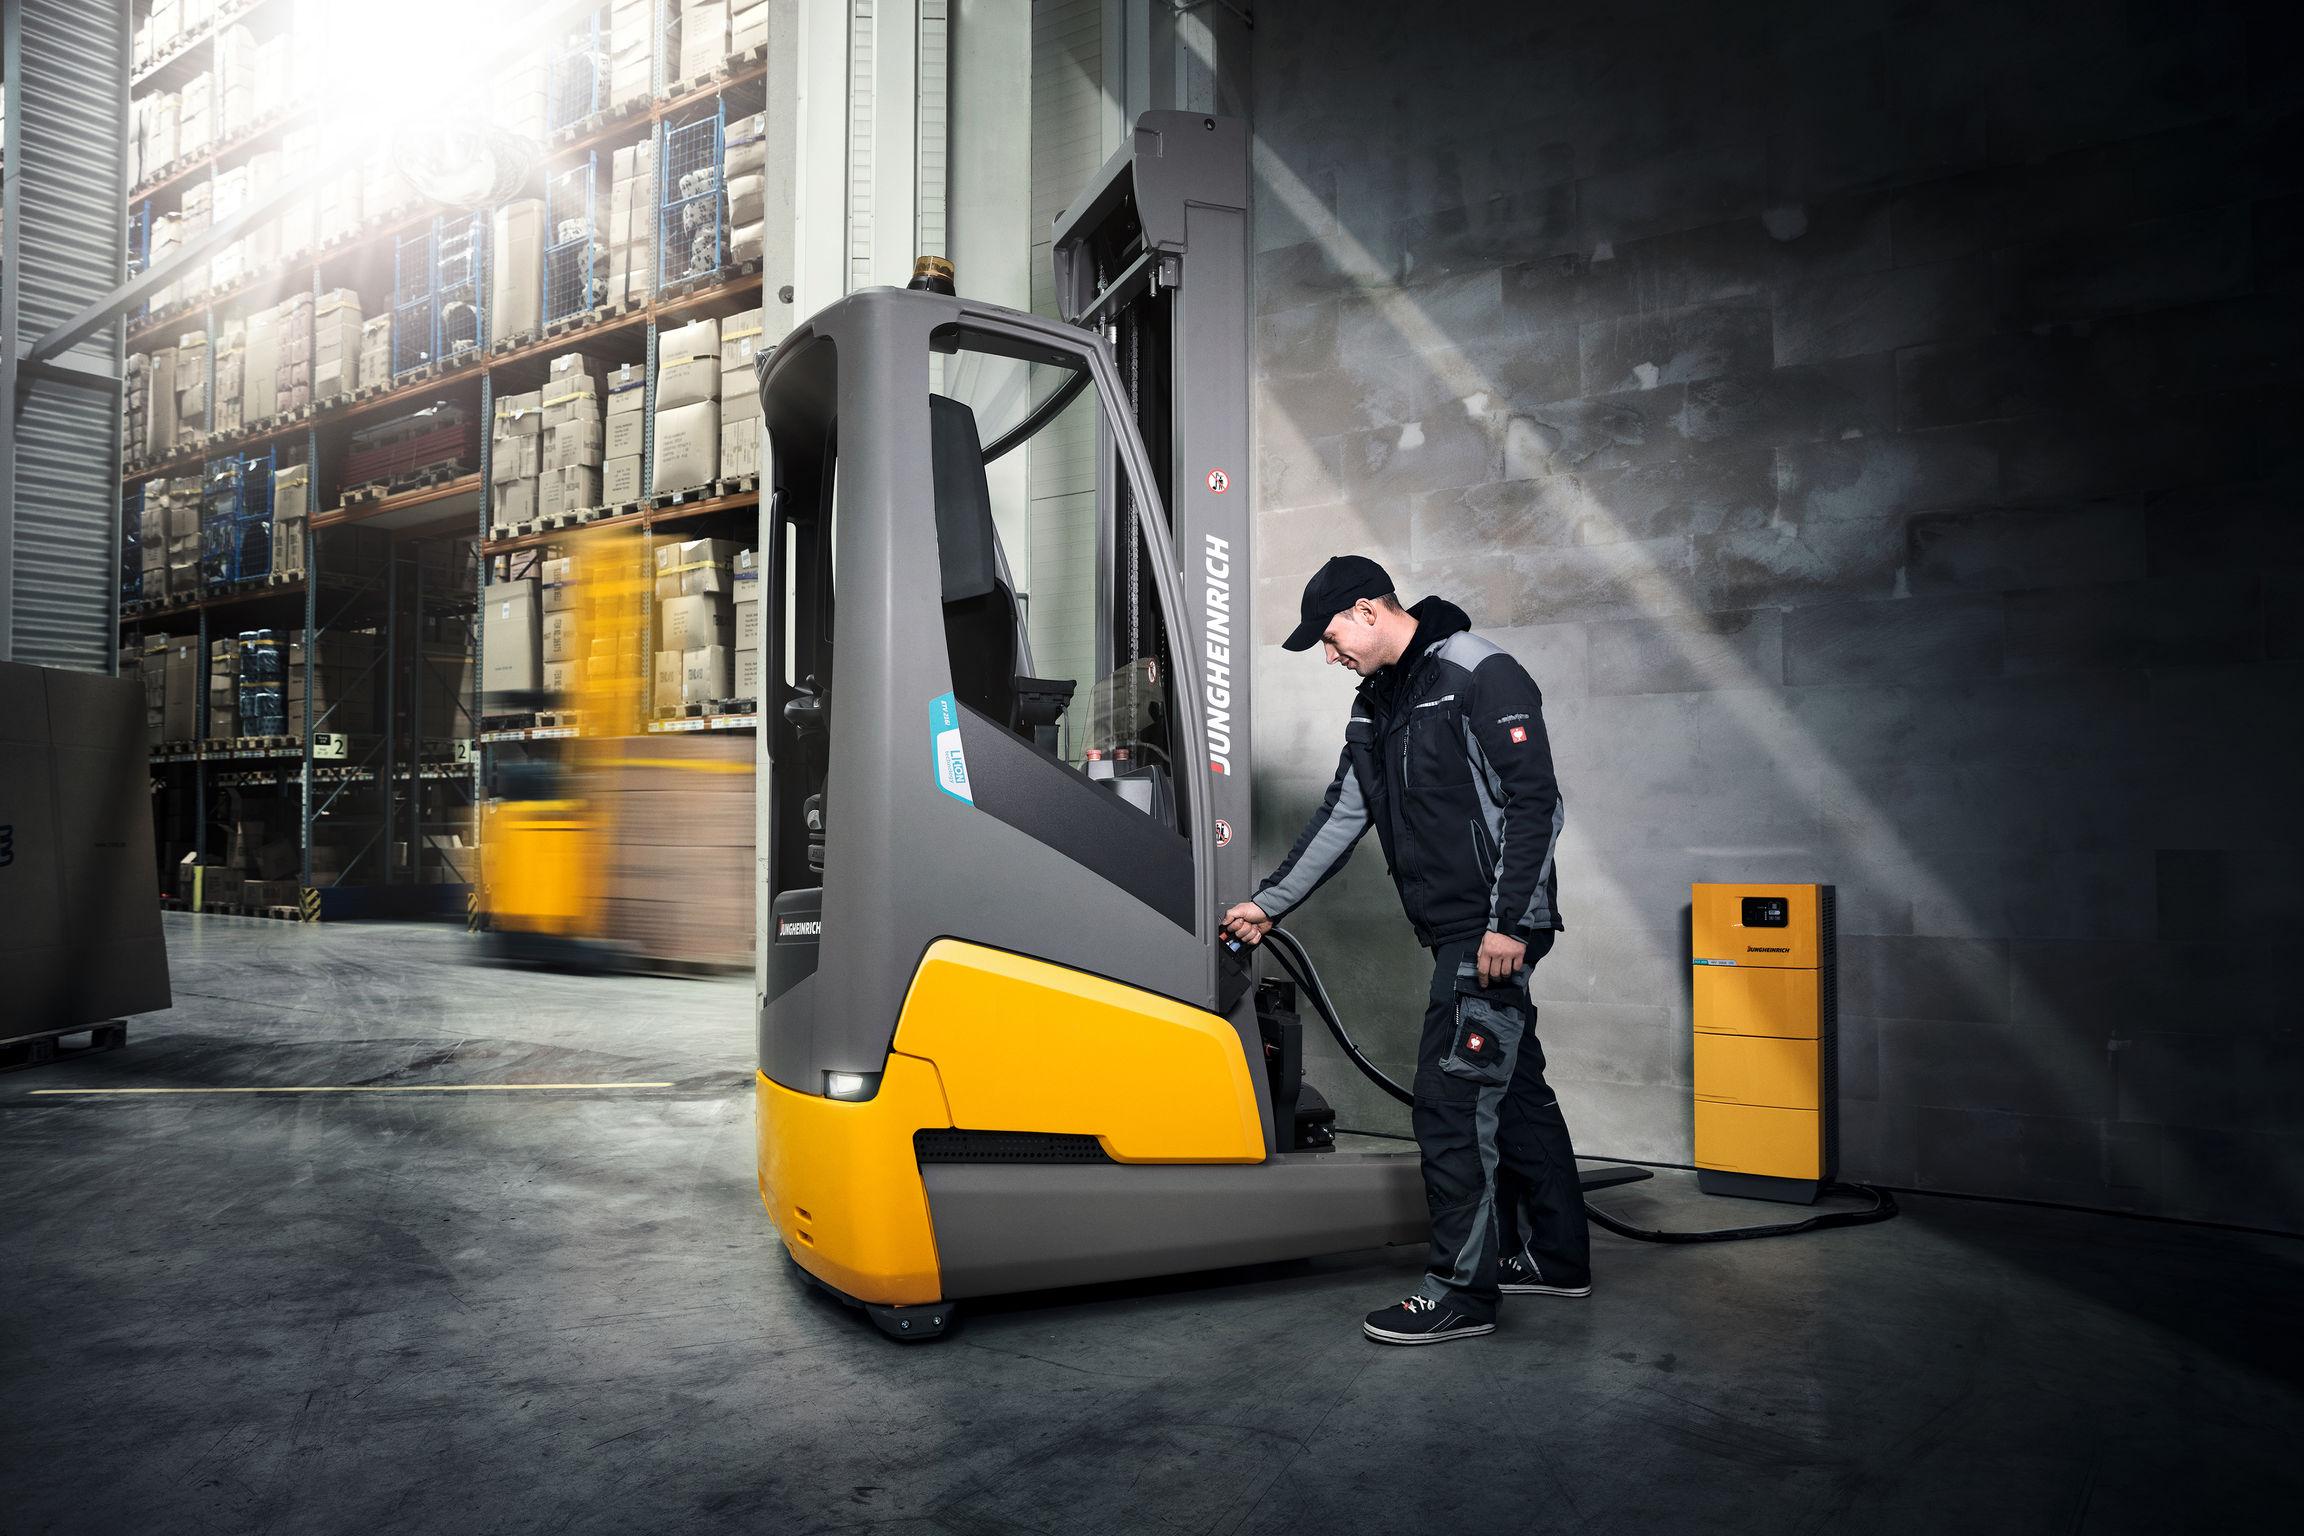 Electric Forklift Jungheinrich Erv308: Jungheinrich's Electric Lift Truck Wins IFOY Award